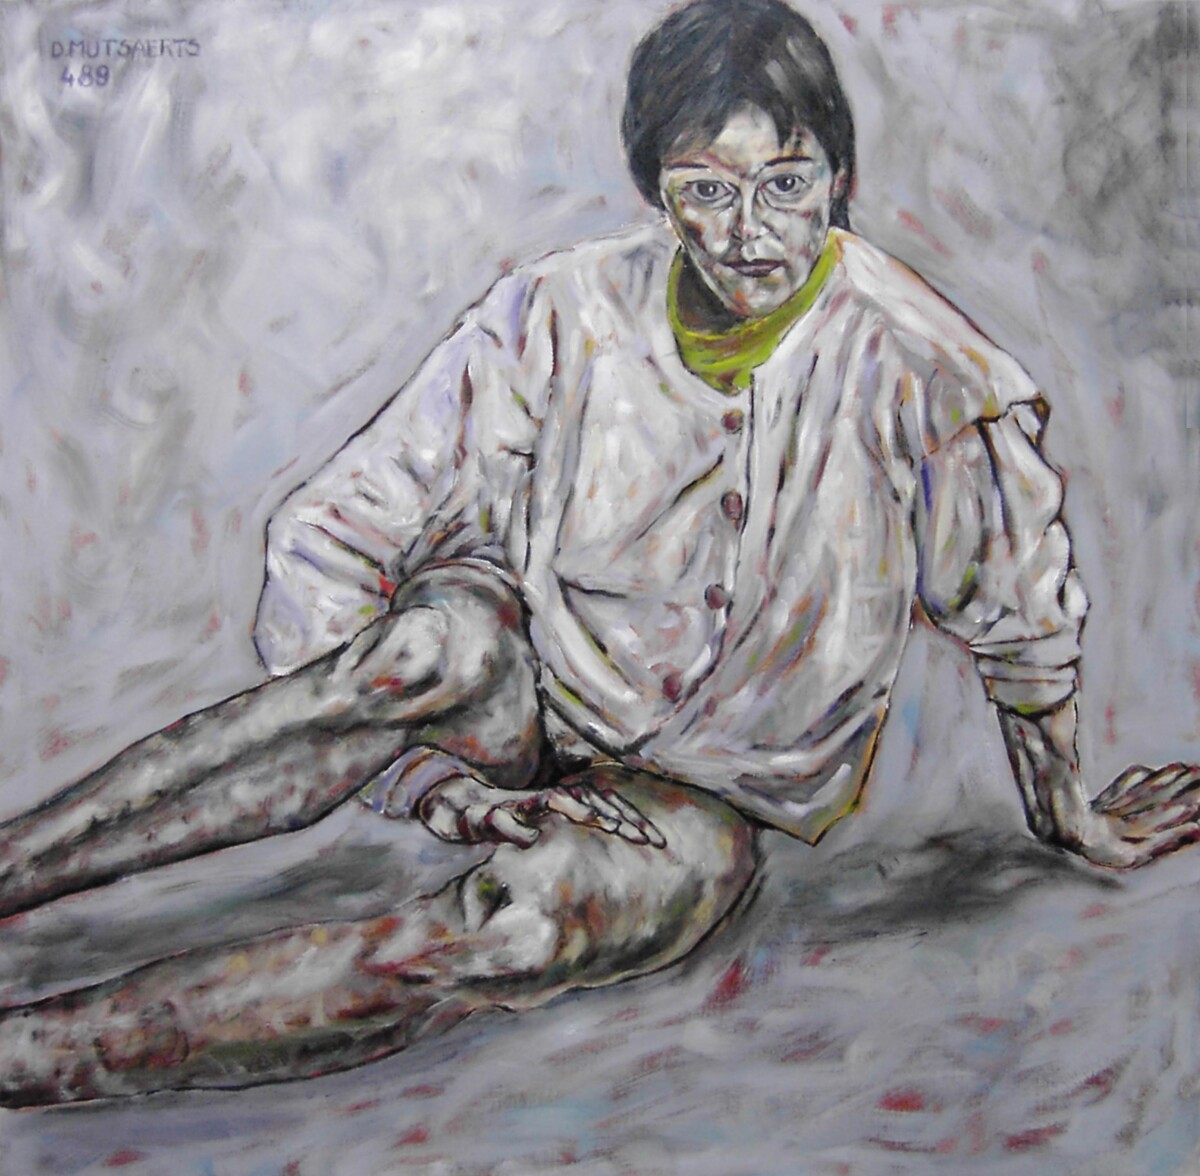 1989.4, oil on canvas, 120*120 cm - Dirk Mutsaerts